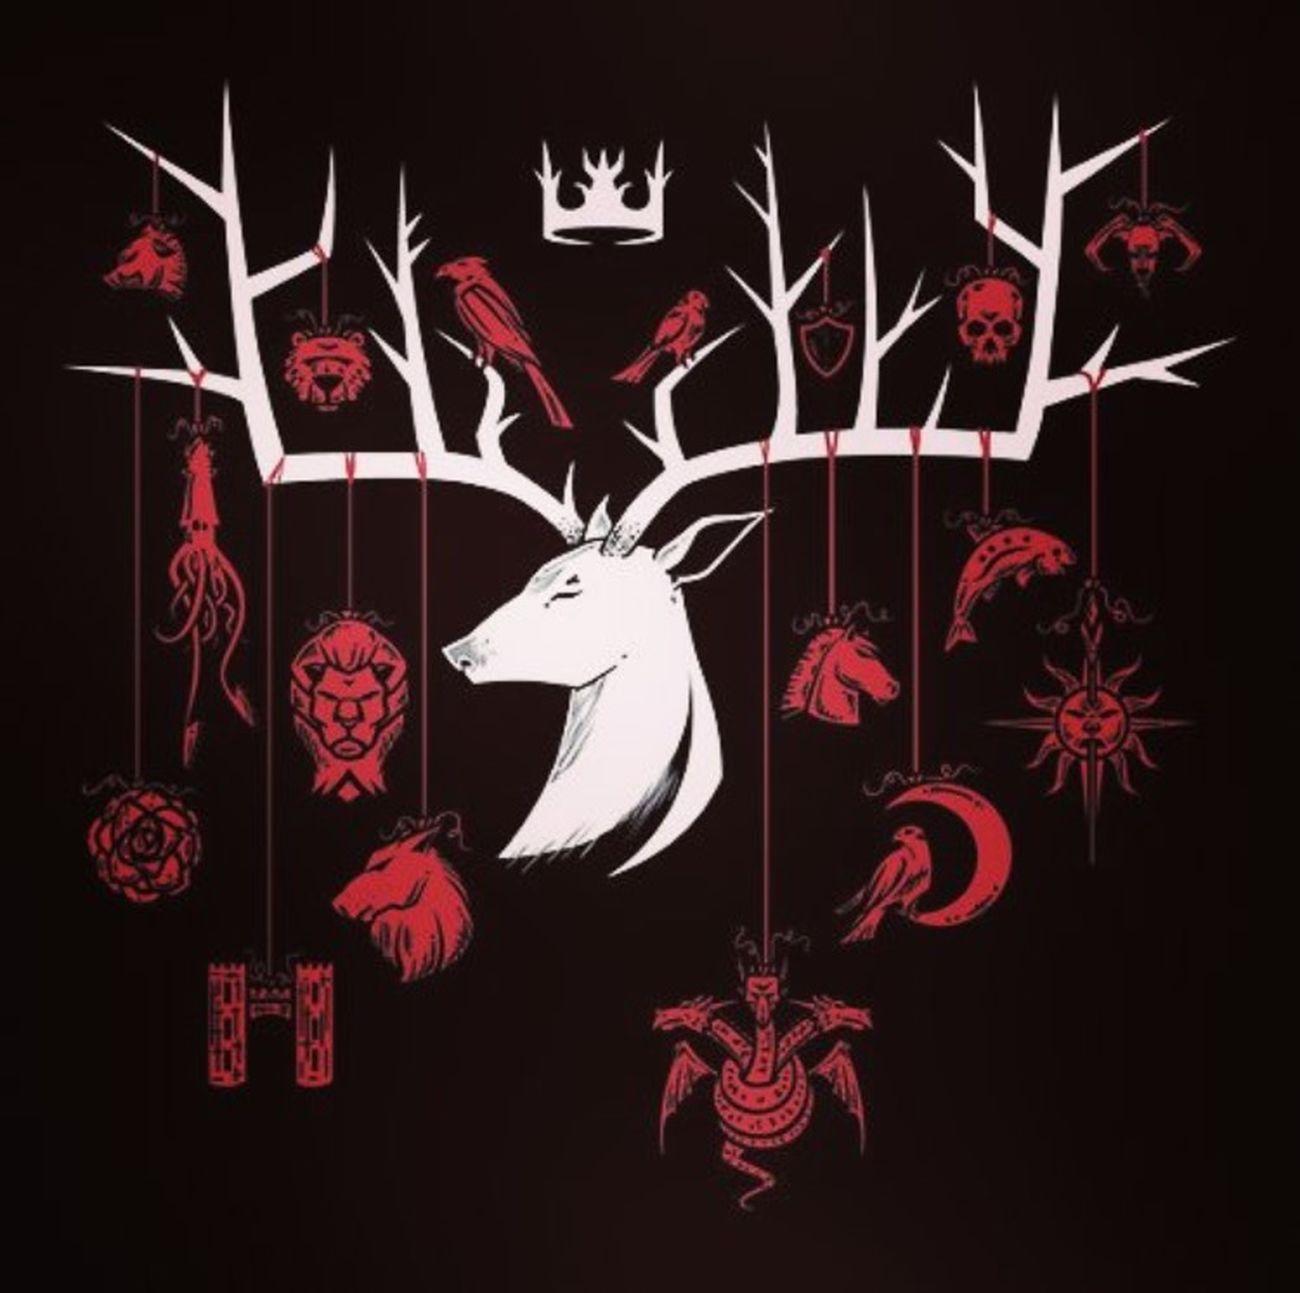 Game Of Thrones Baratheon Stark Lannister Tully Arryn Greyjoy Targaryen Tyrell Martell Bolton Frey Baelish